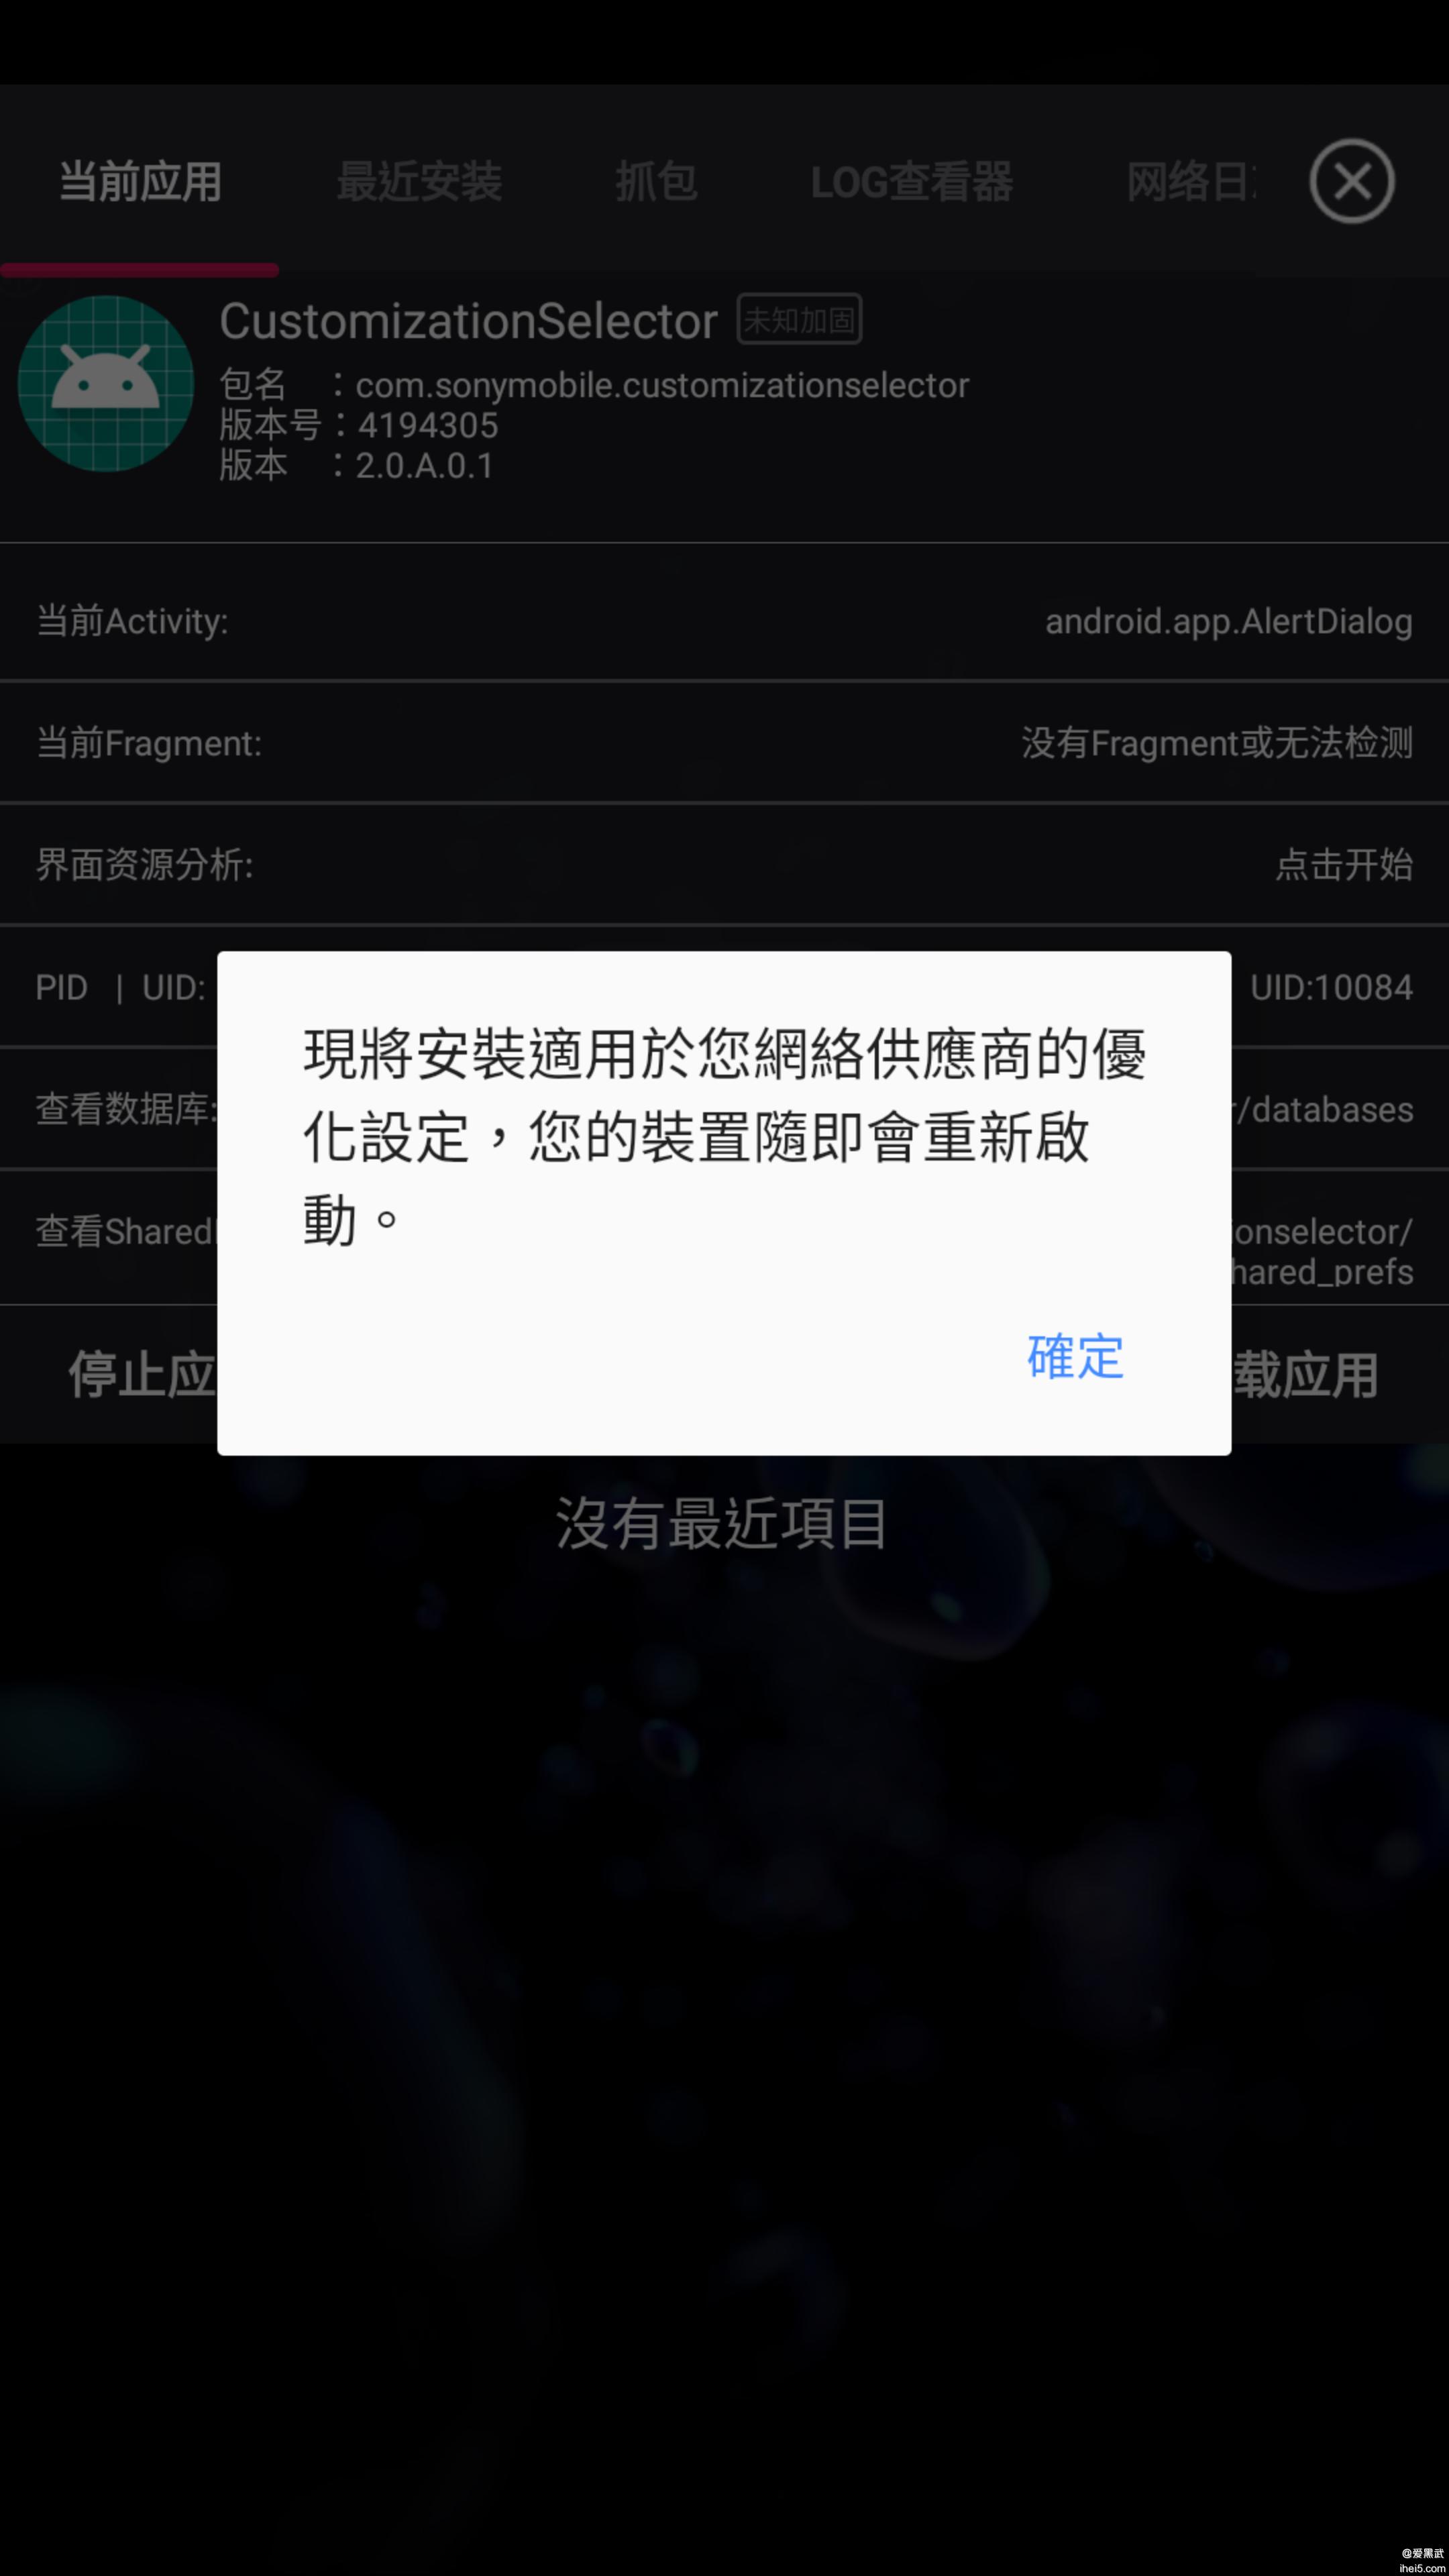 9.0_CustomizationSelector_弹窗包名.png